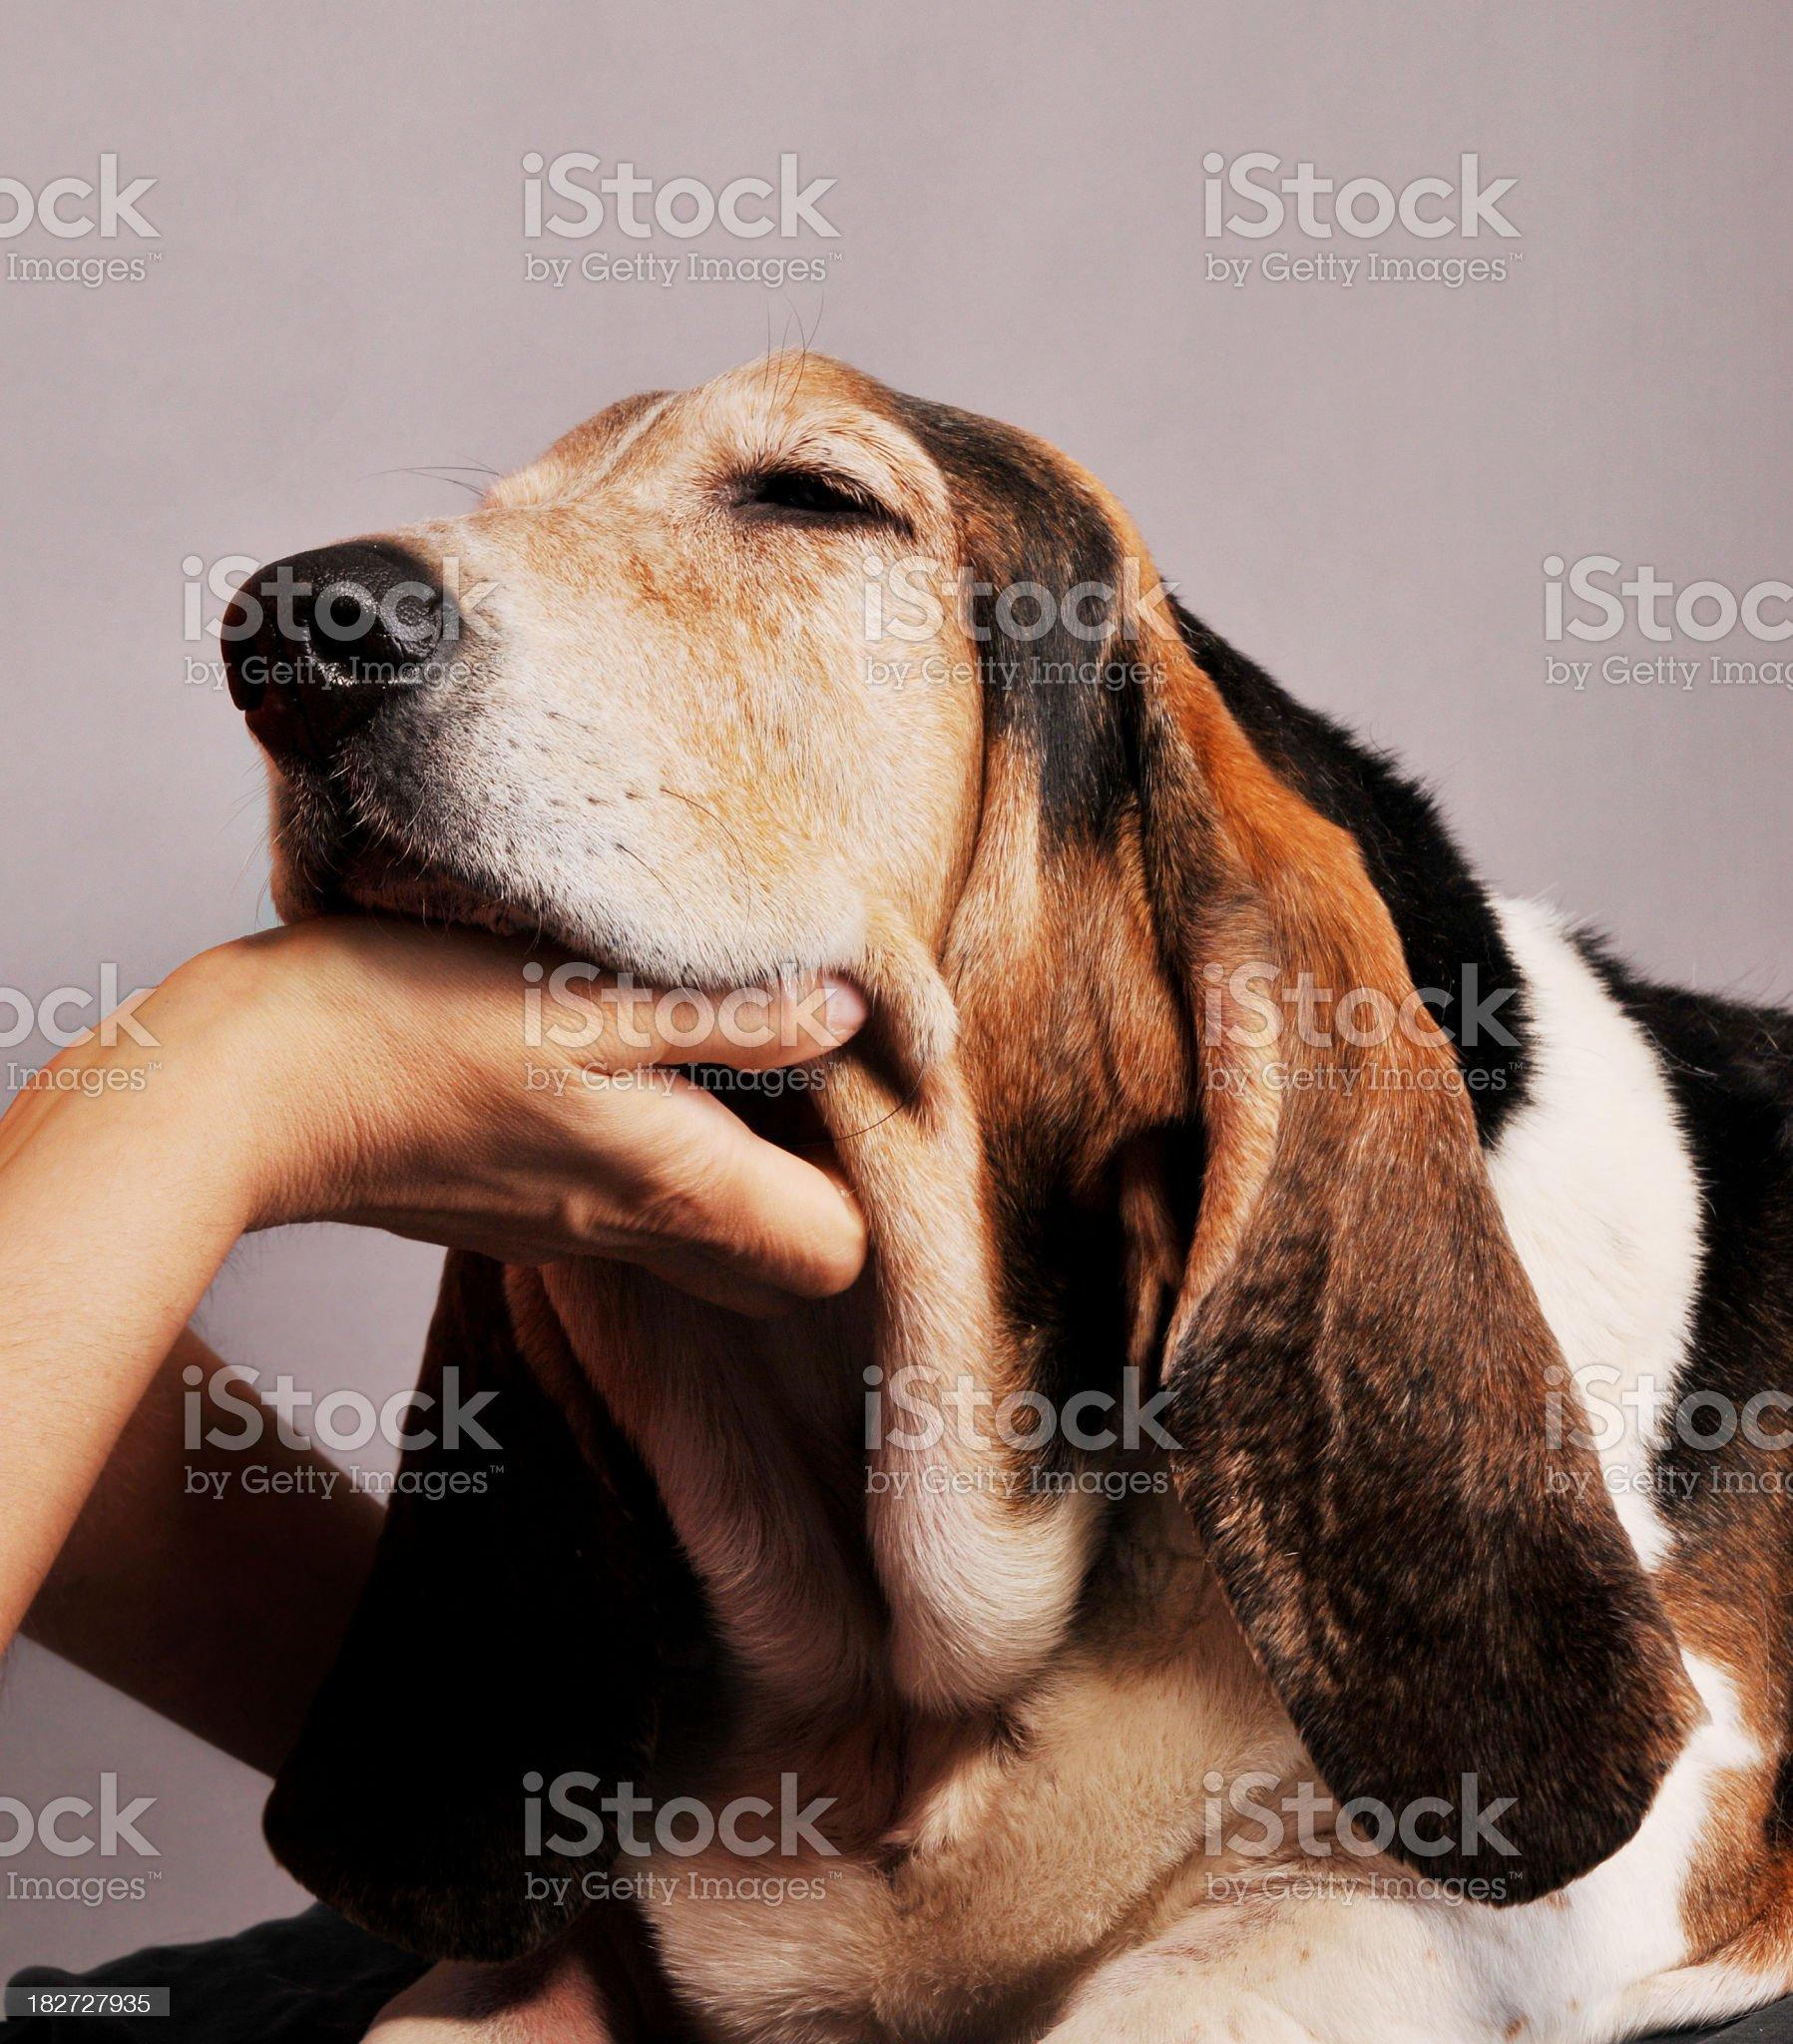 Close-up of beagle enjoying chin rub from a human royalty-free stock photo